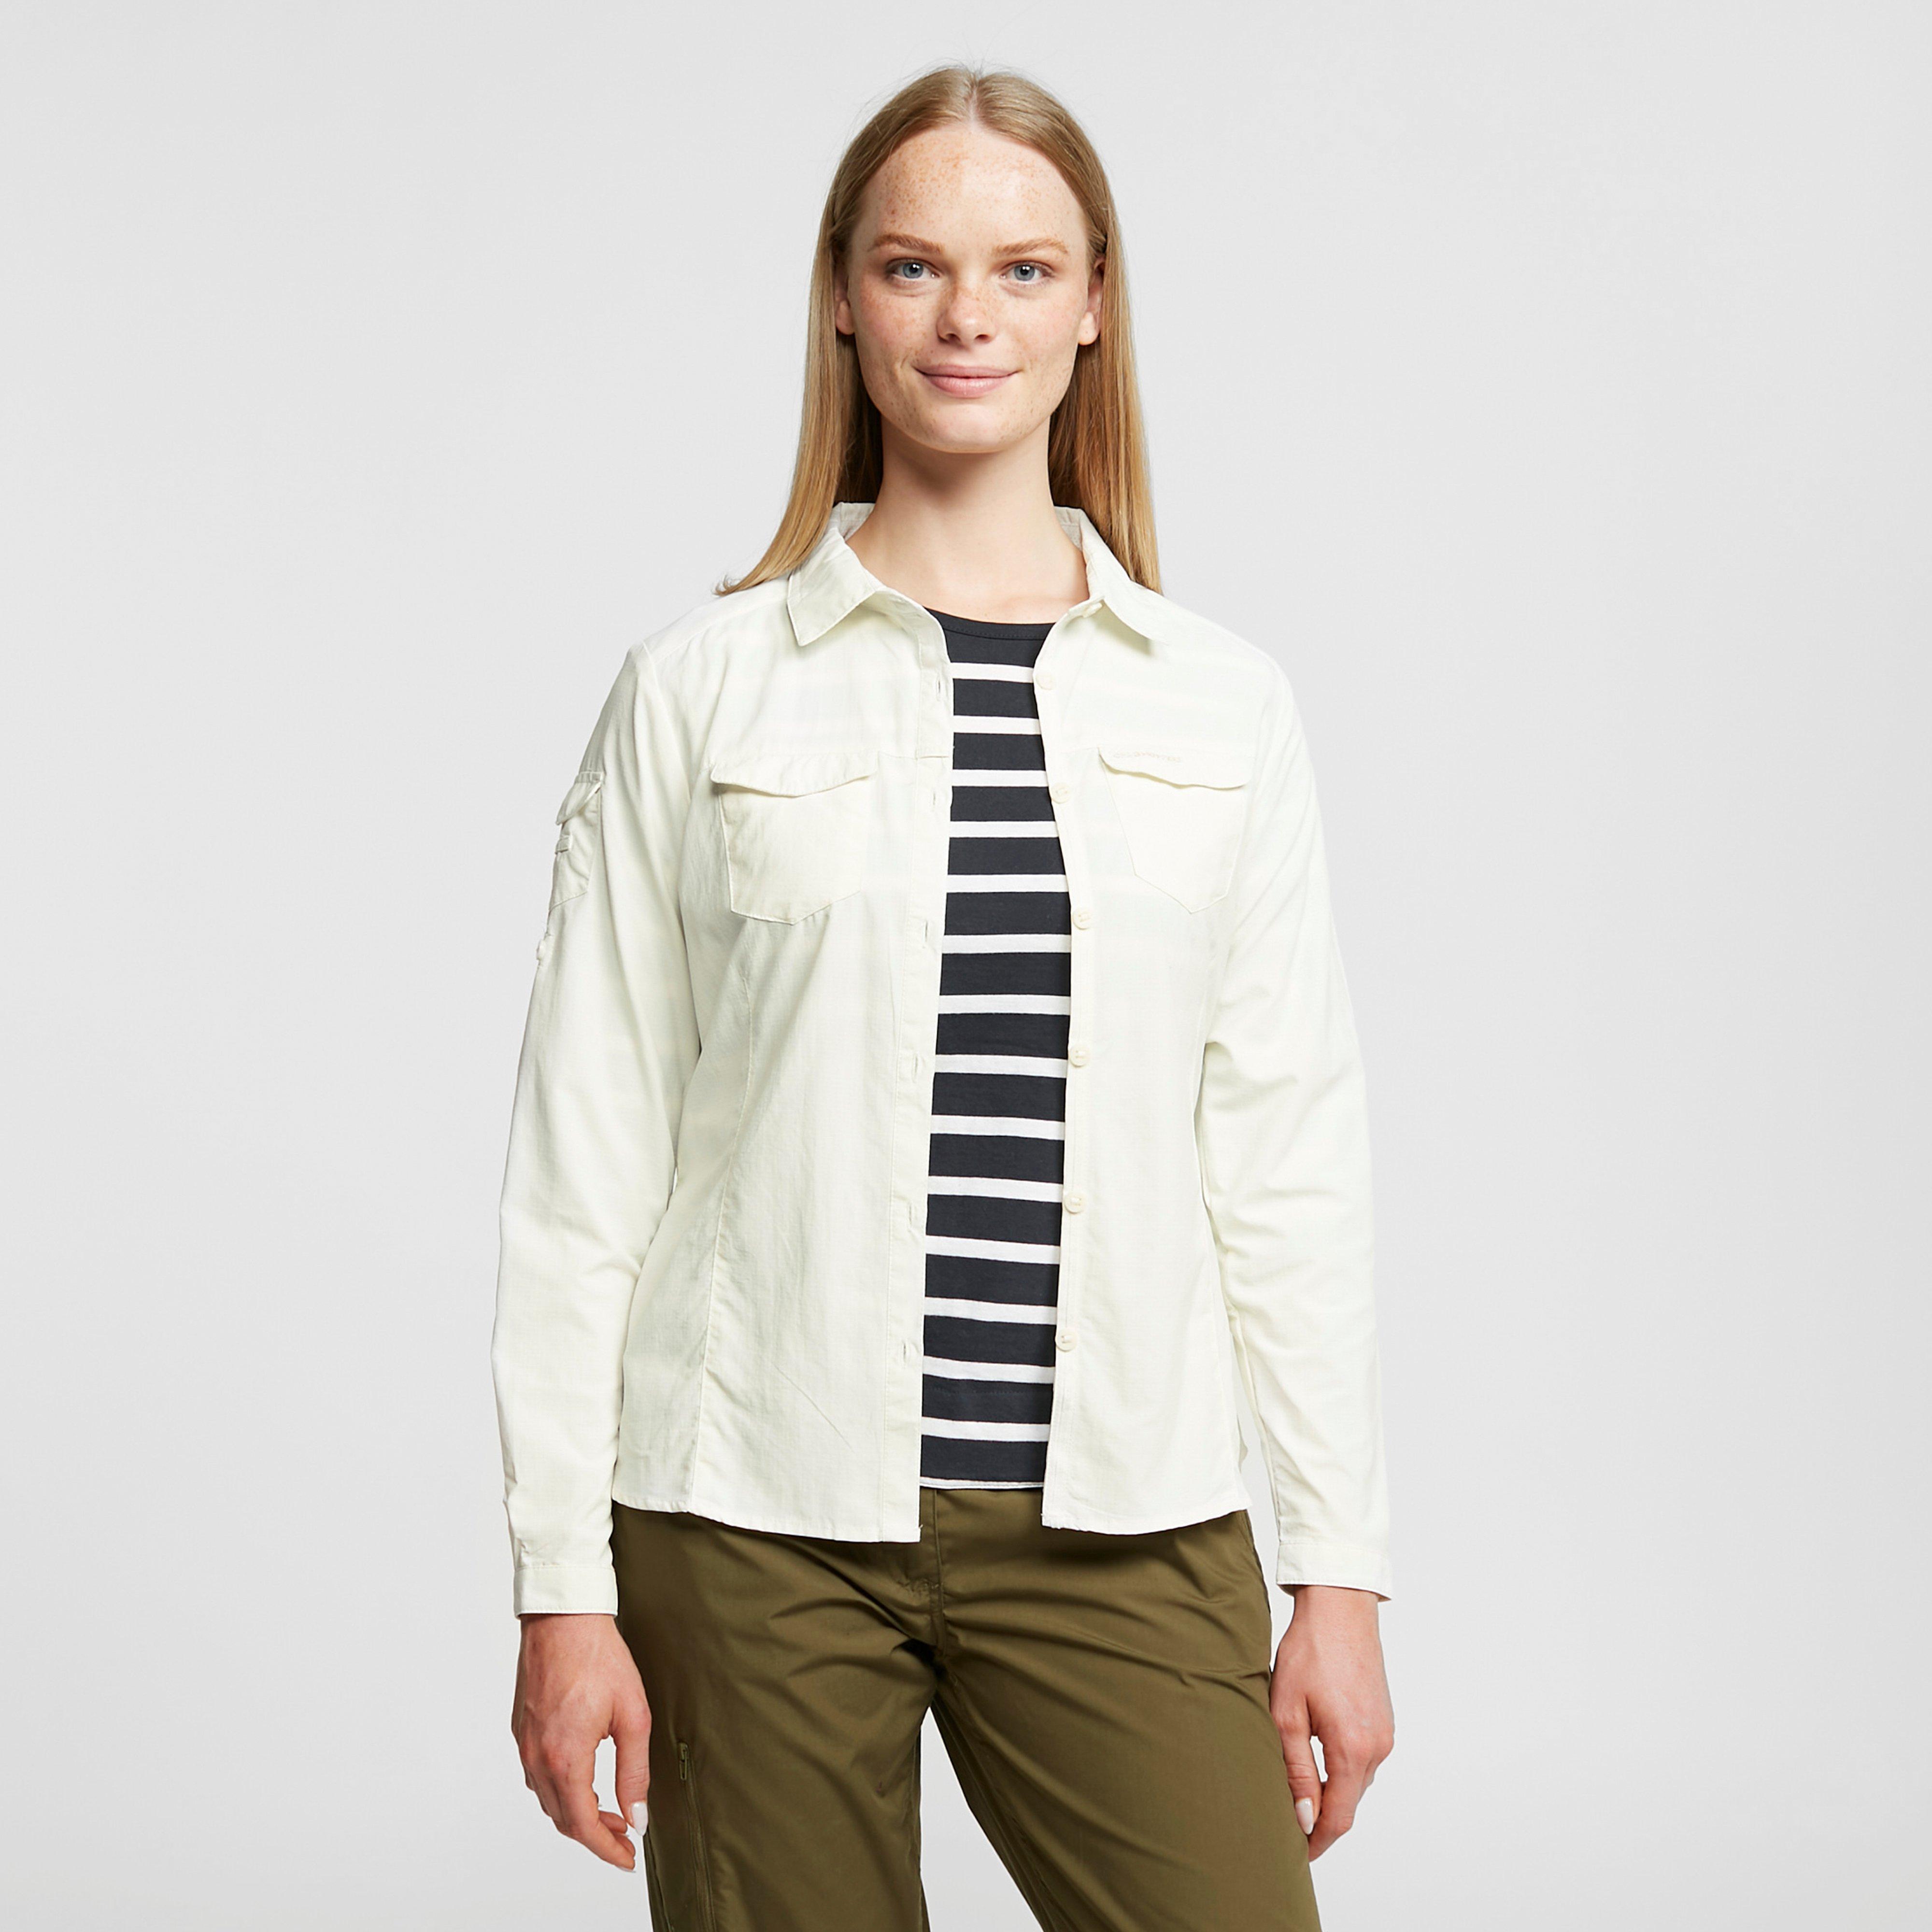 Craghoppers Women's Nosilife Adventure Ii Long Sleeved Shirt - Beige/Bge, Beige